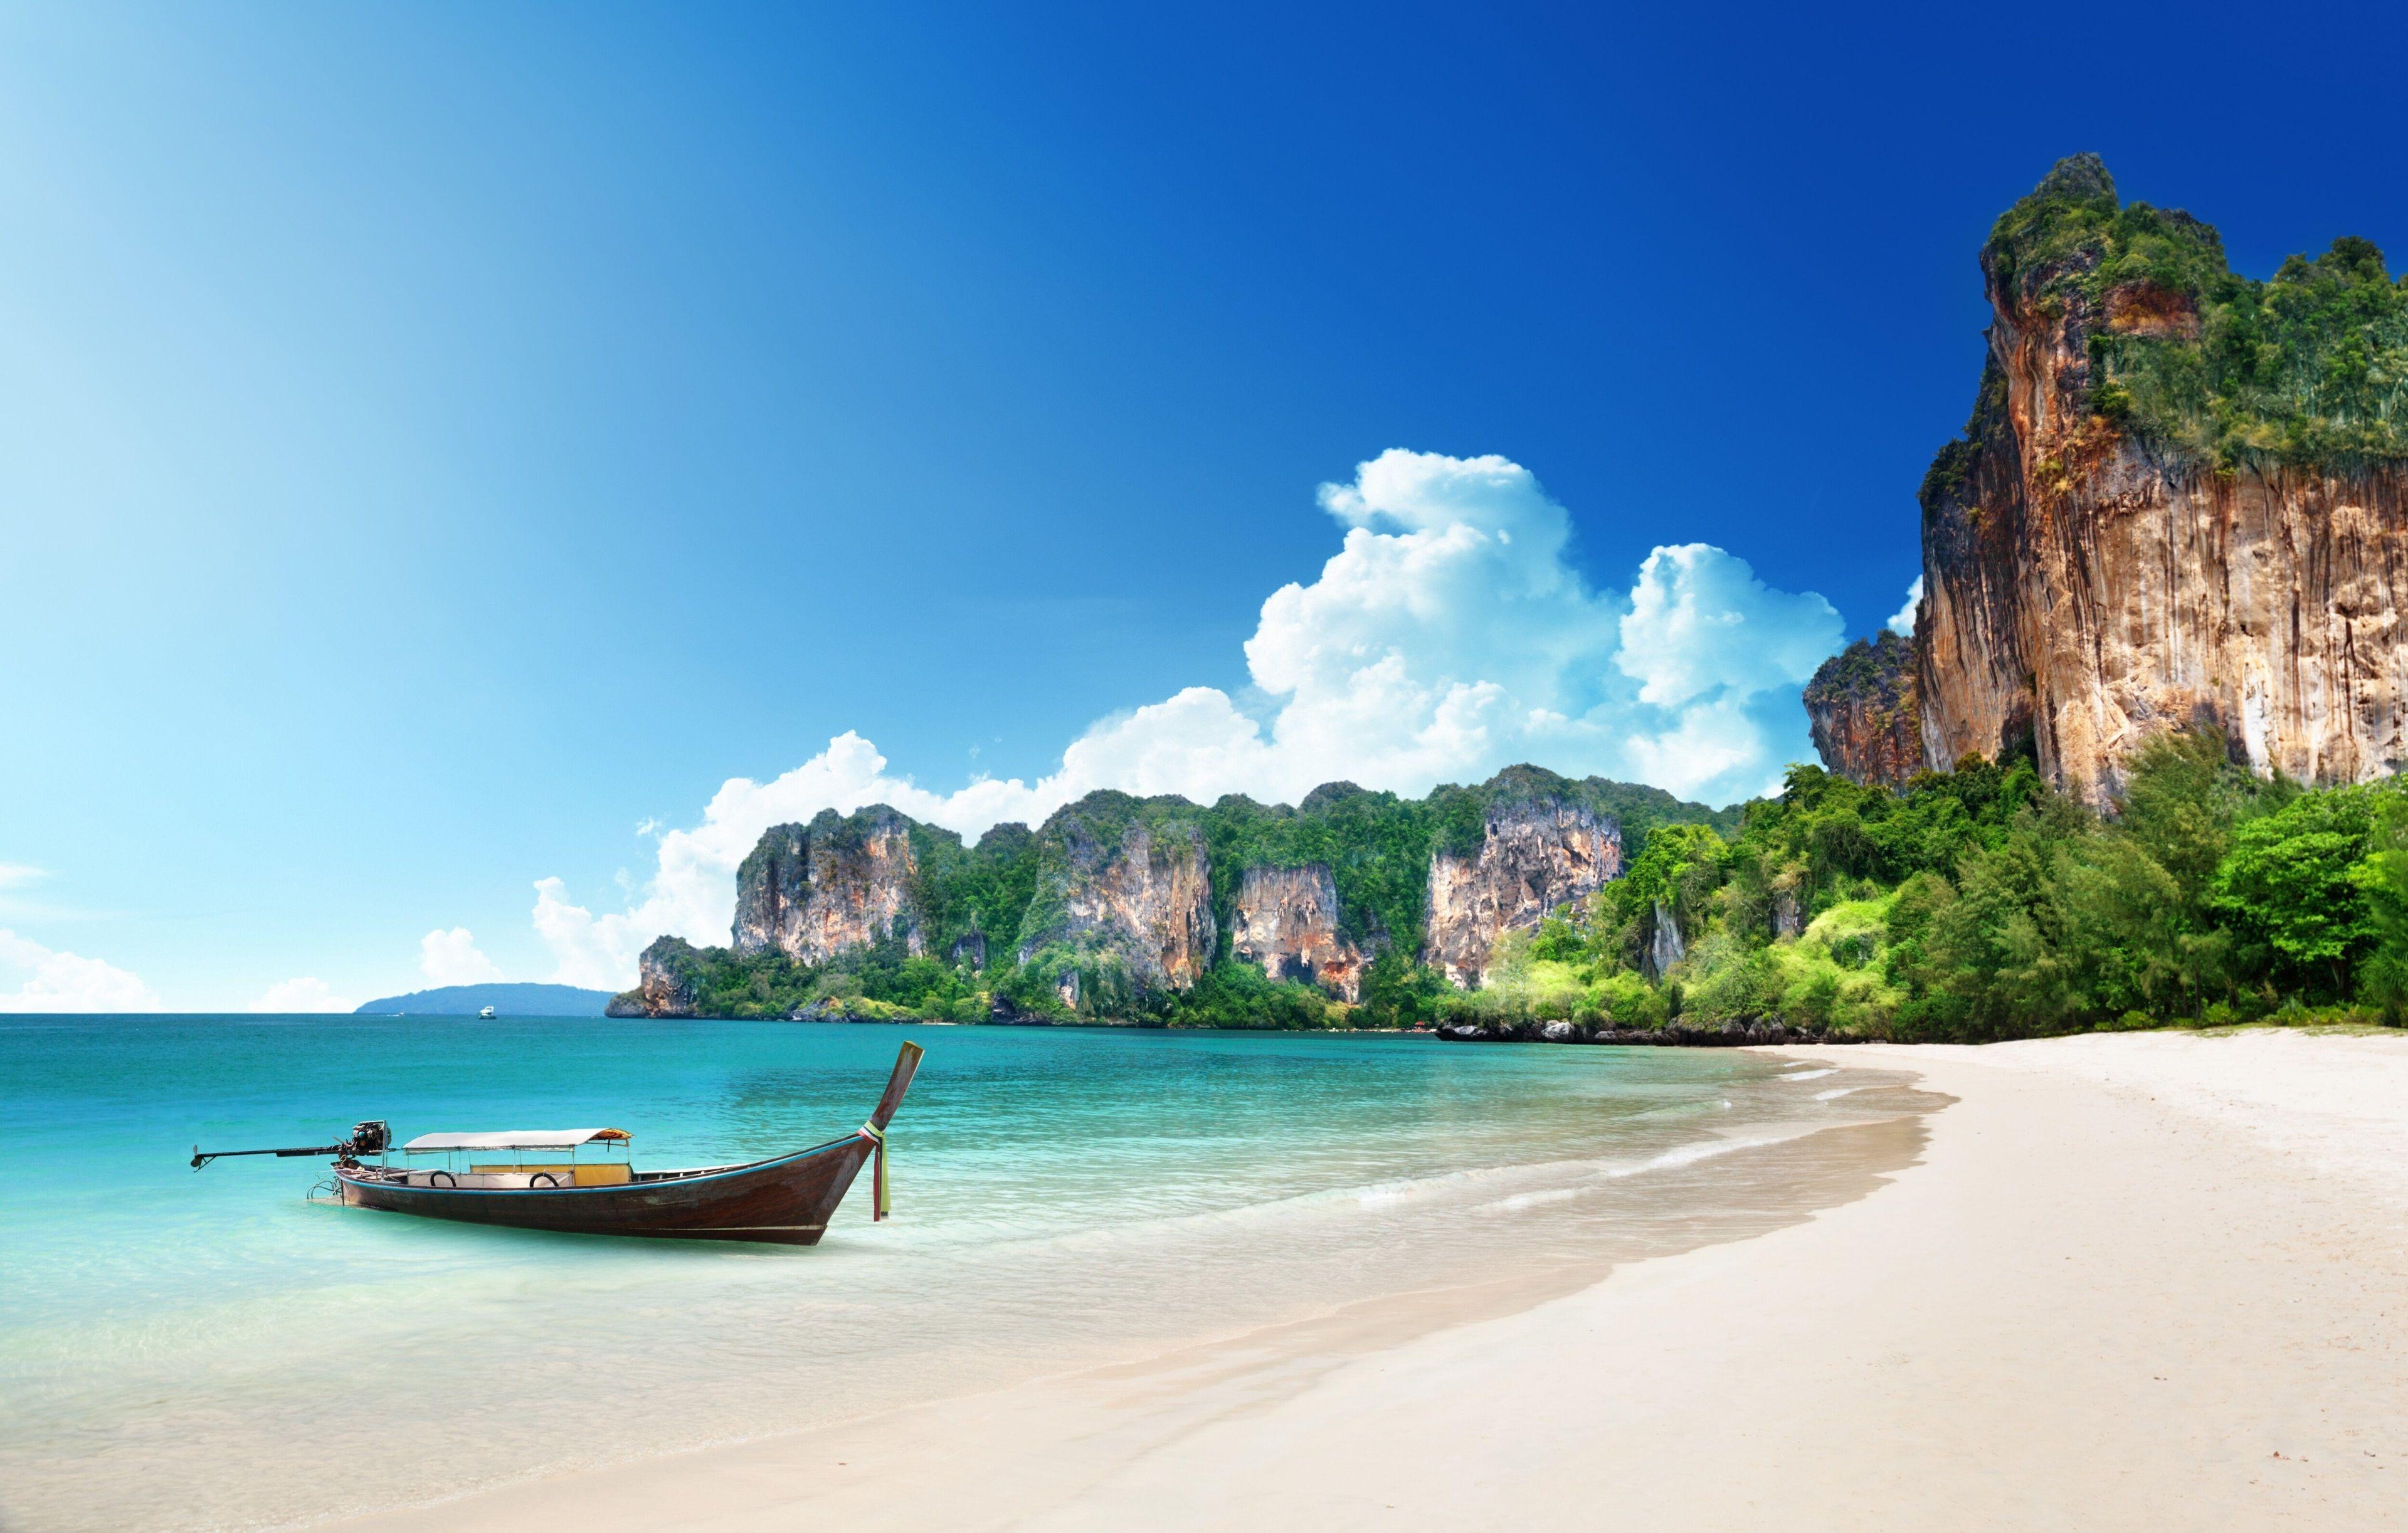 3840x2445 thailand 4k hd pc wallpaper free download